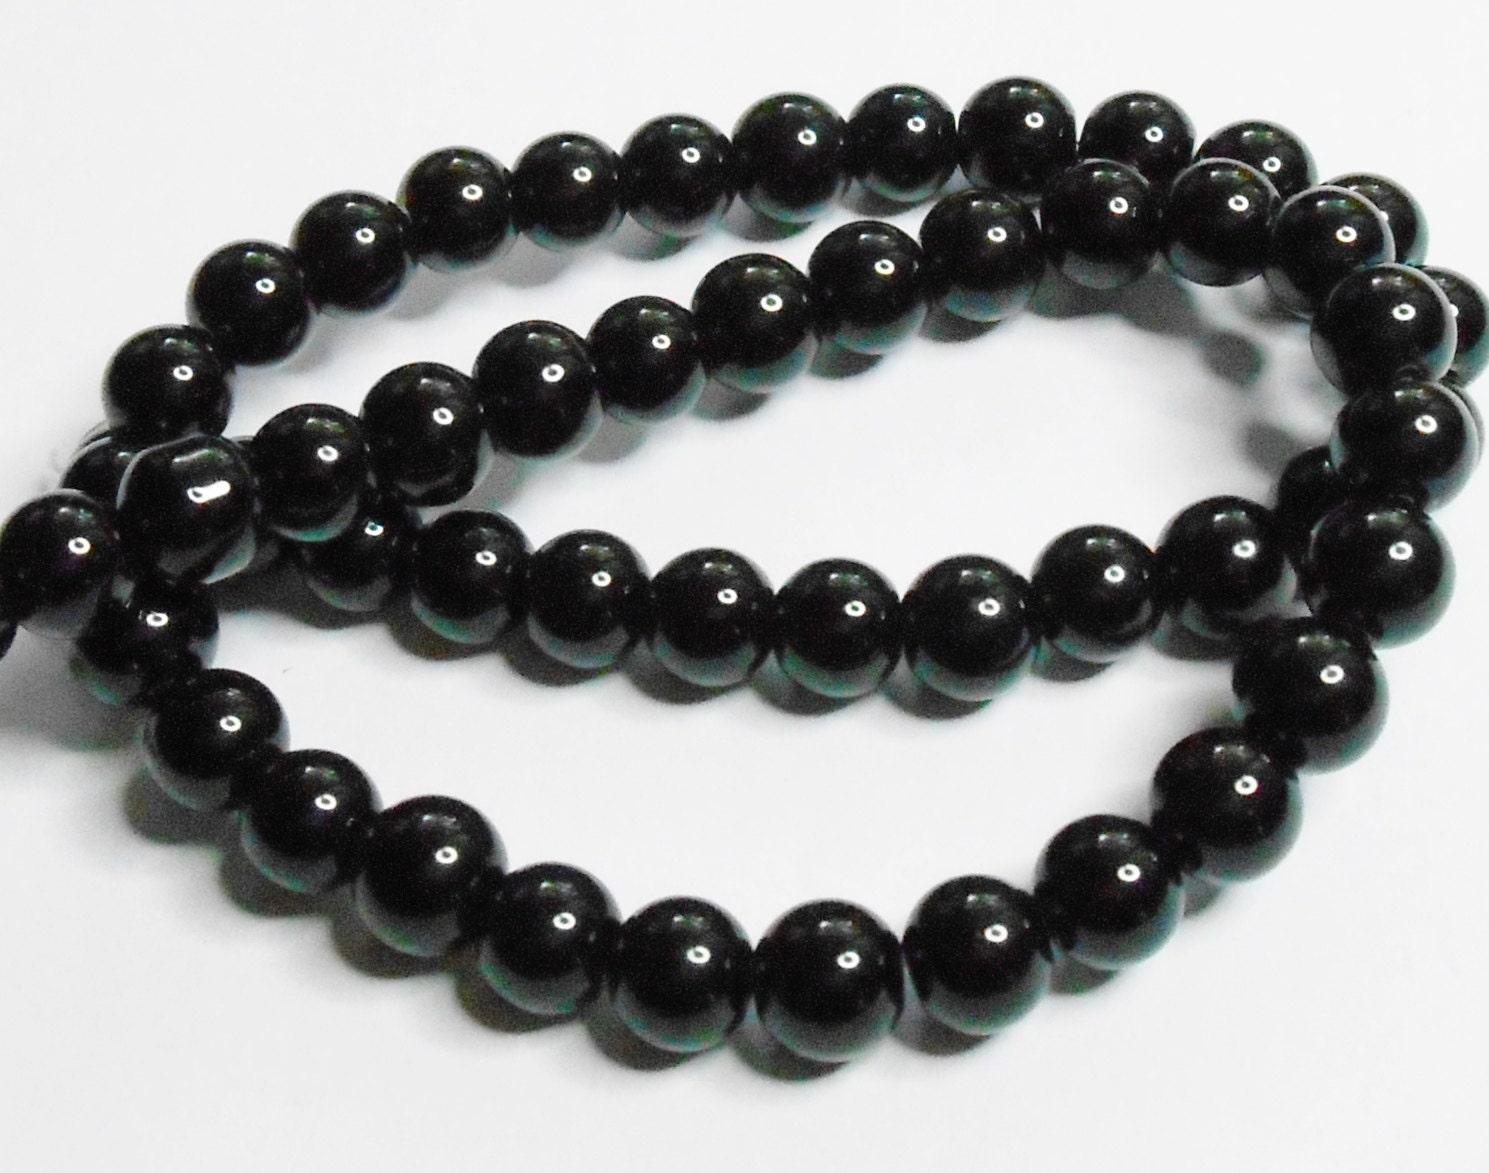 8mm round black onyx agate gemstone beads for jewelry making for Birthstone beads for jewelry making